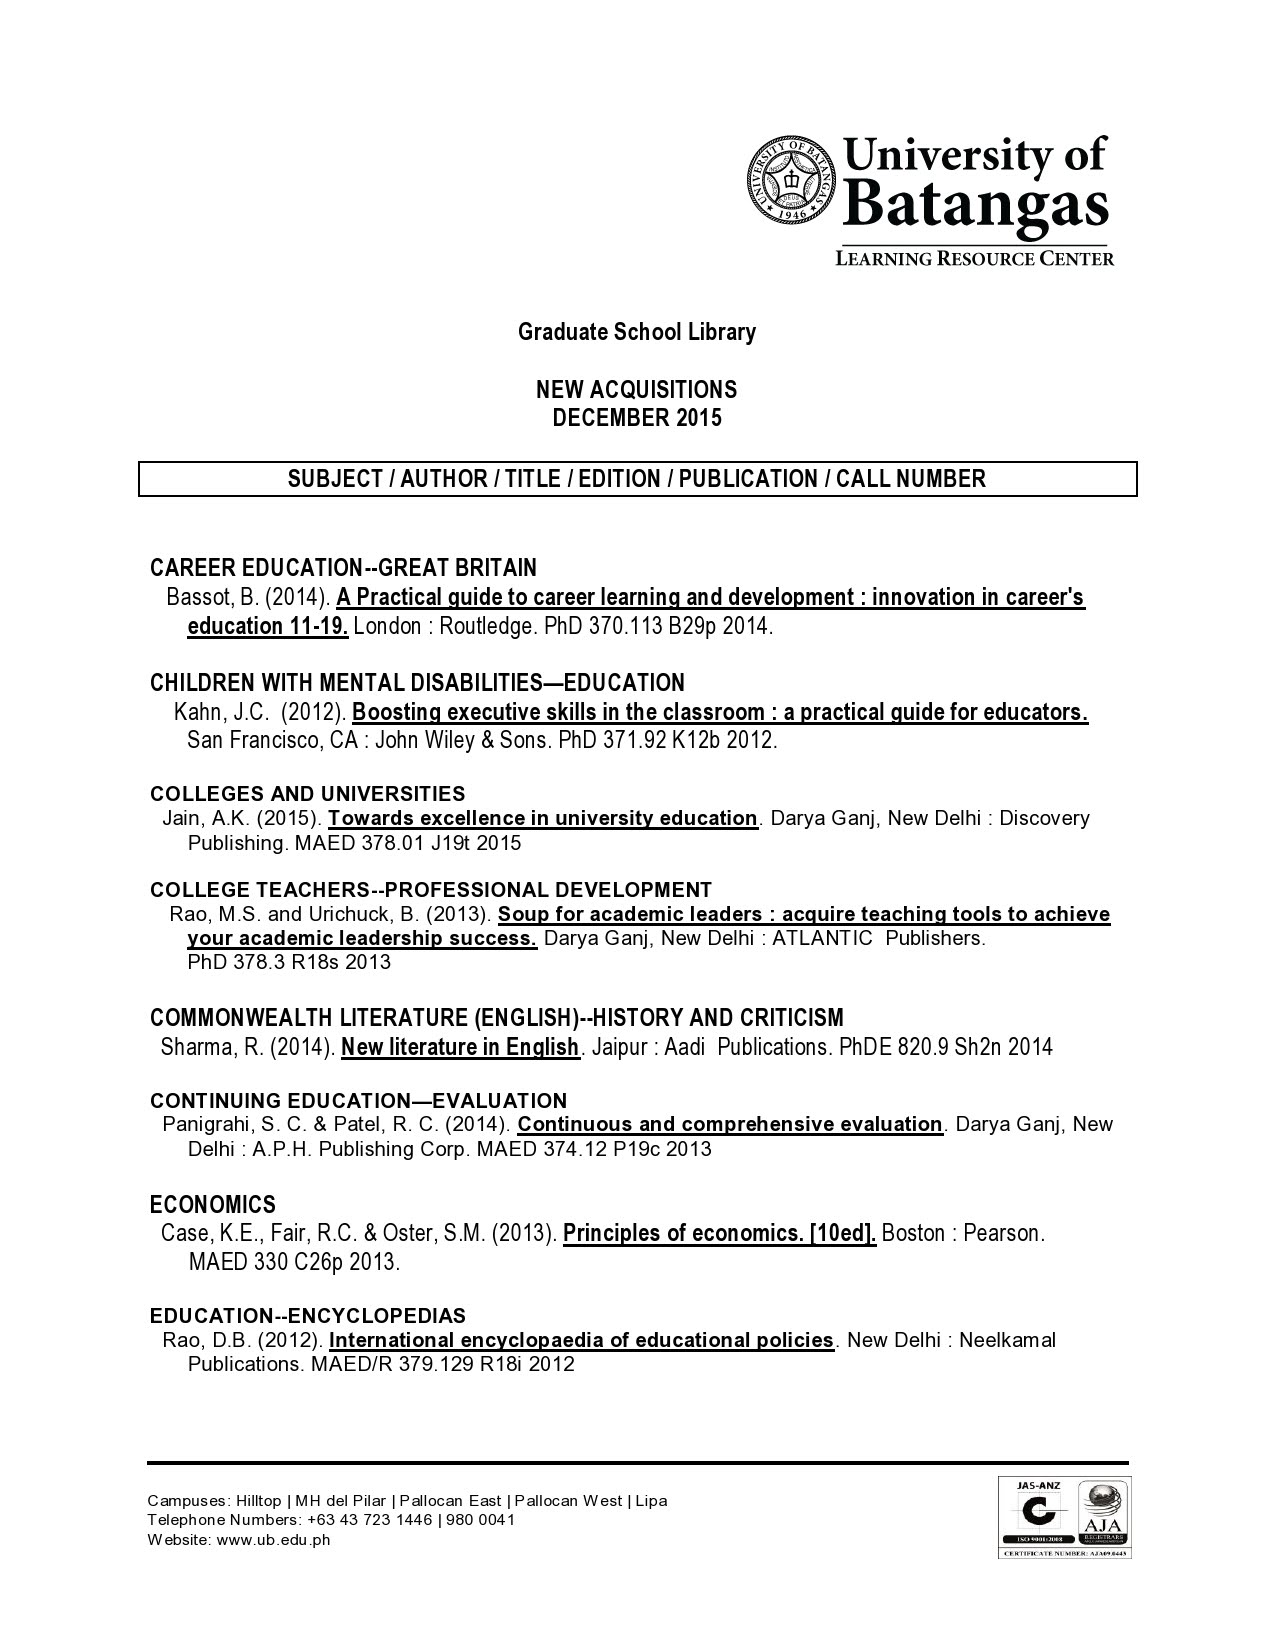 Principles of economics case fair array new acquisitions for december 2015 graduate school library rh sites google com fandeluxe Gallery